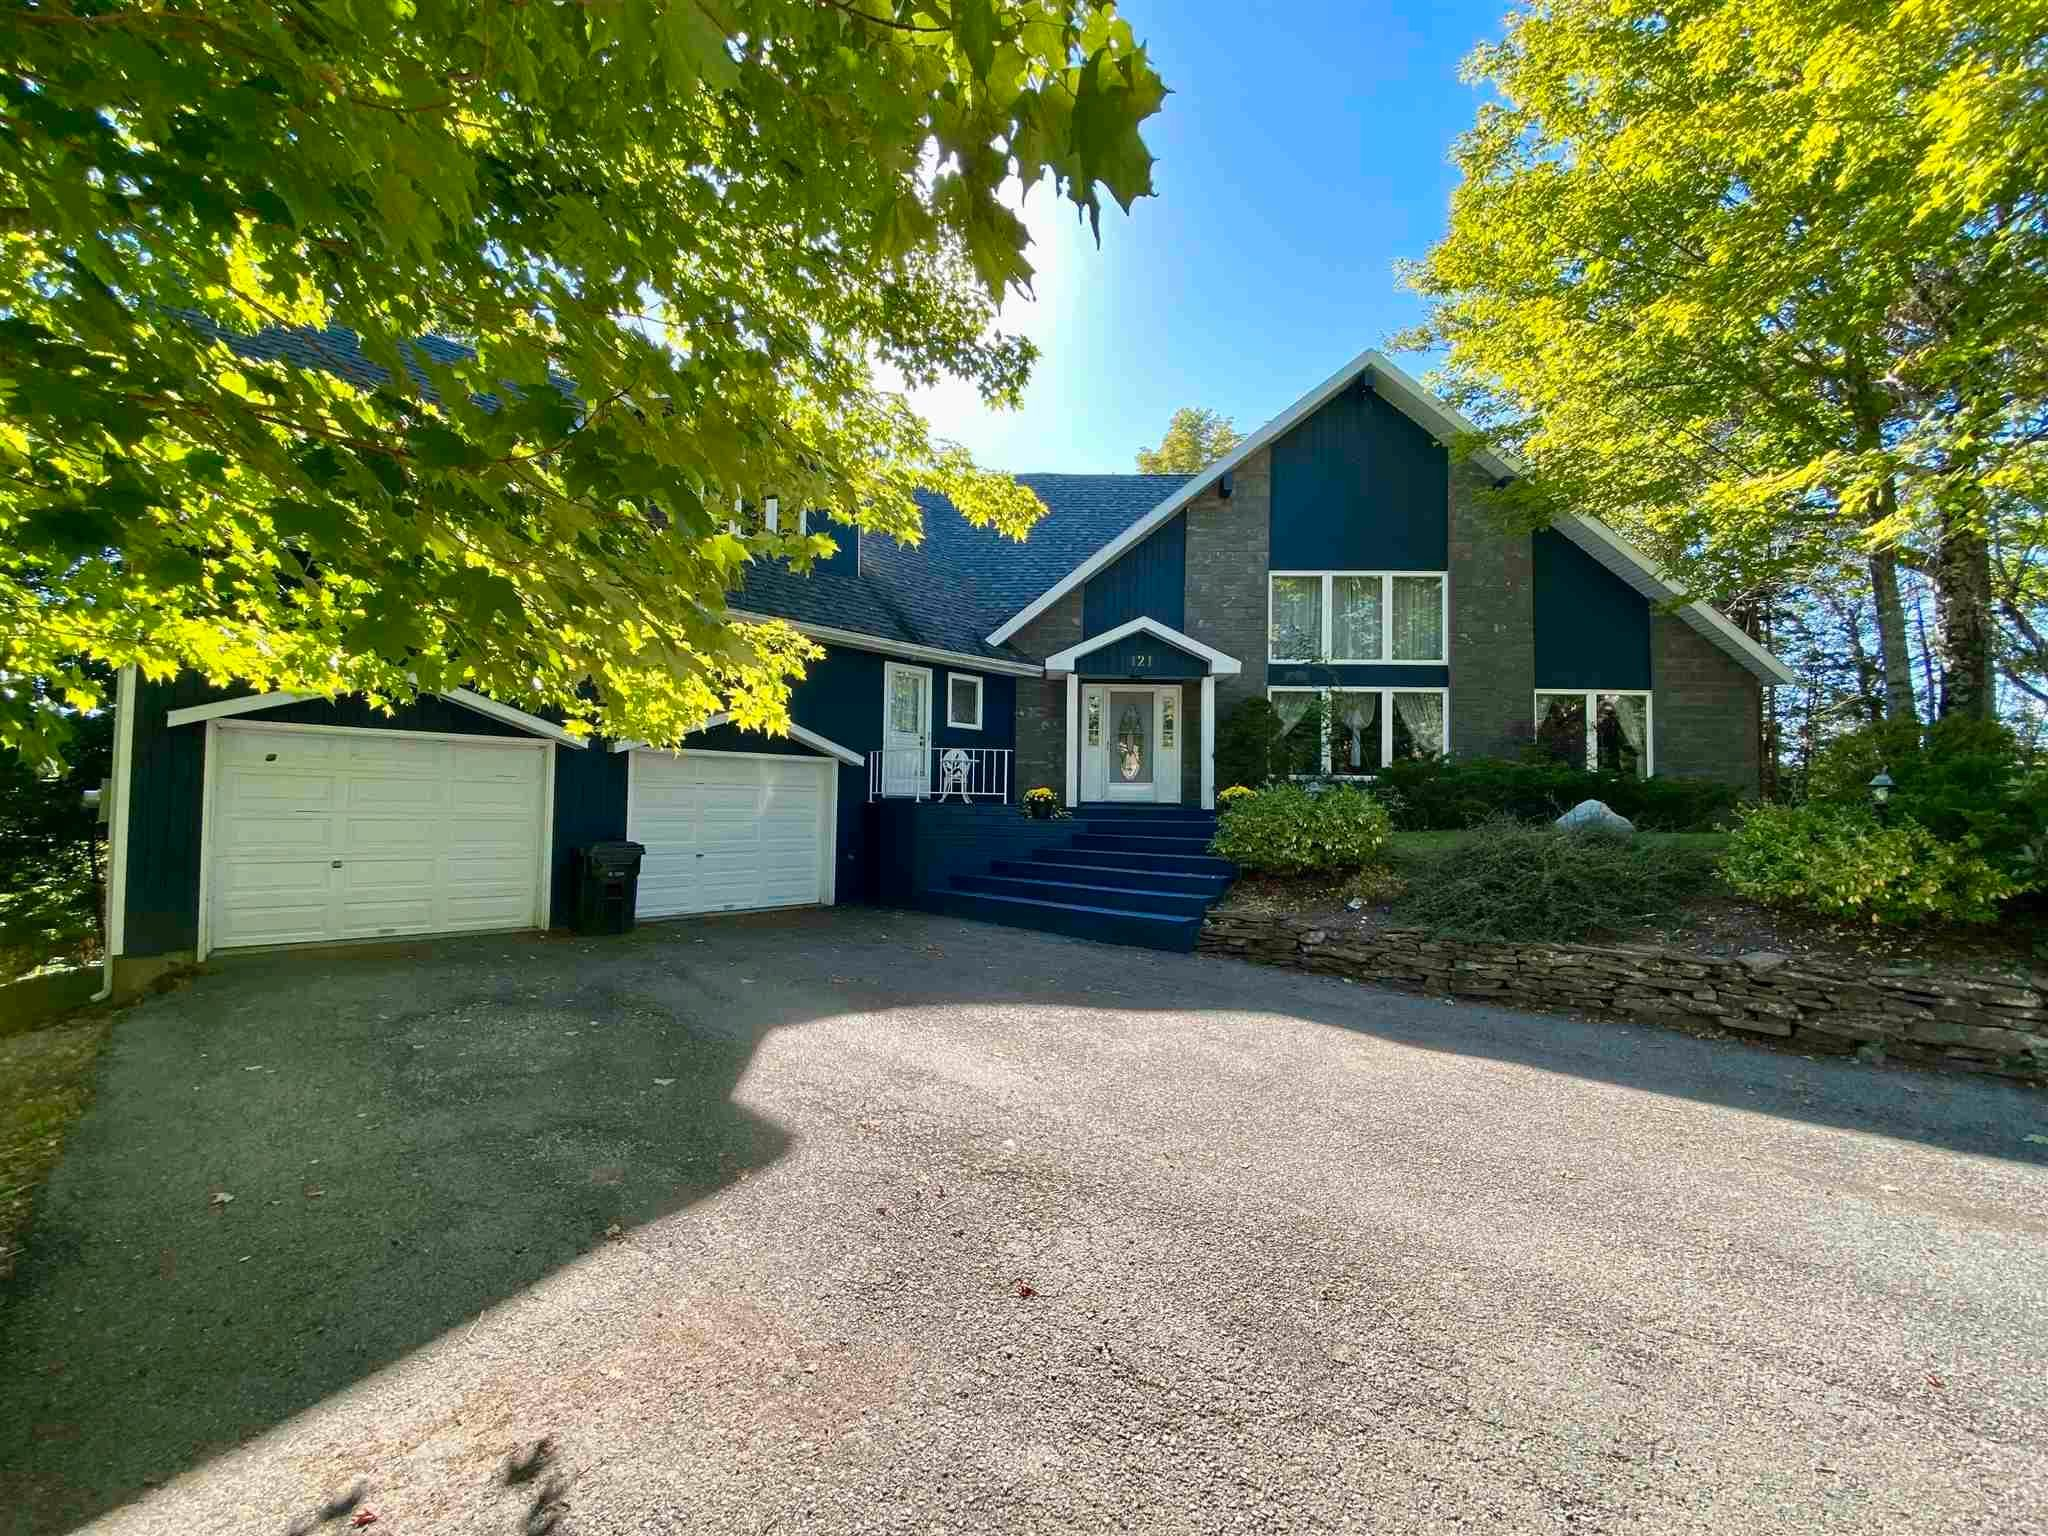 Main Photo: 121 Delta Drive in Howie Centre: 202-Sydney River / Coxheath Residential for sale (Cape Breton)  : MLS®# 202124425